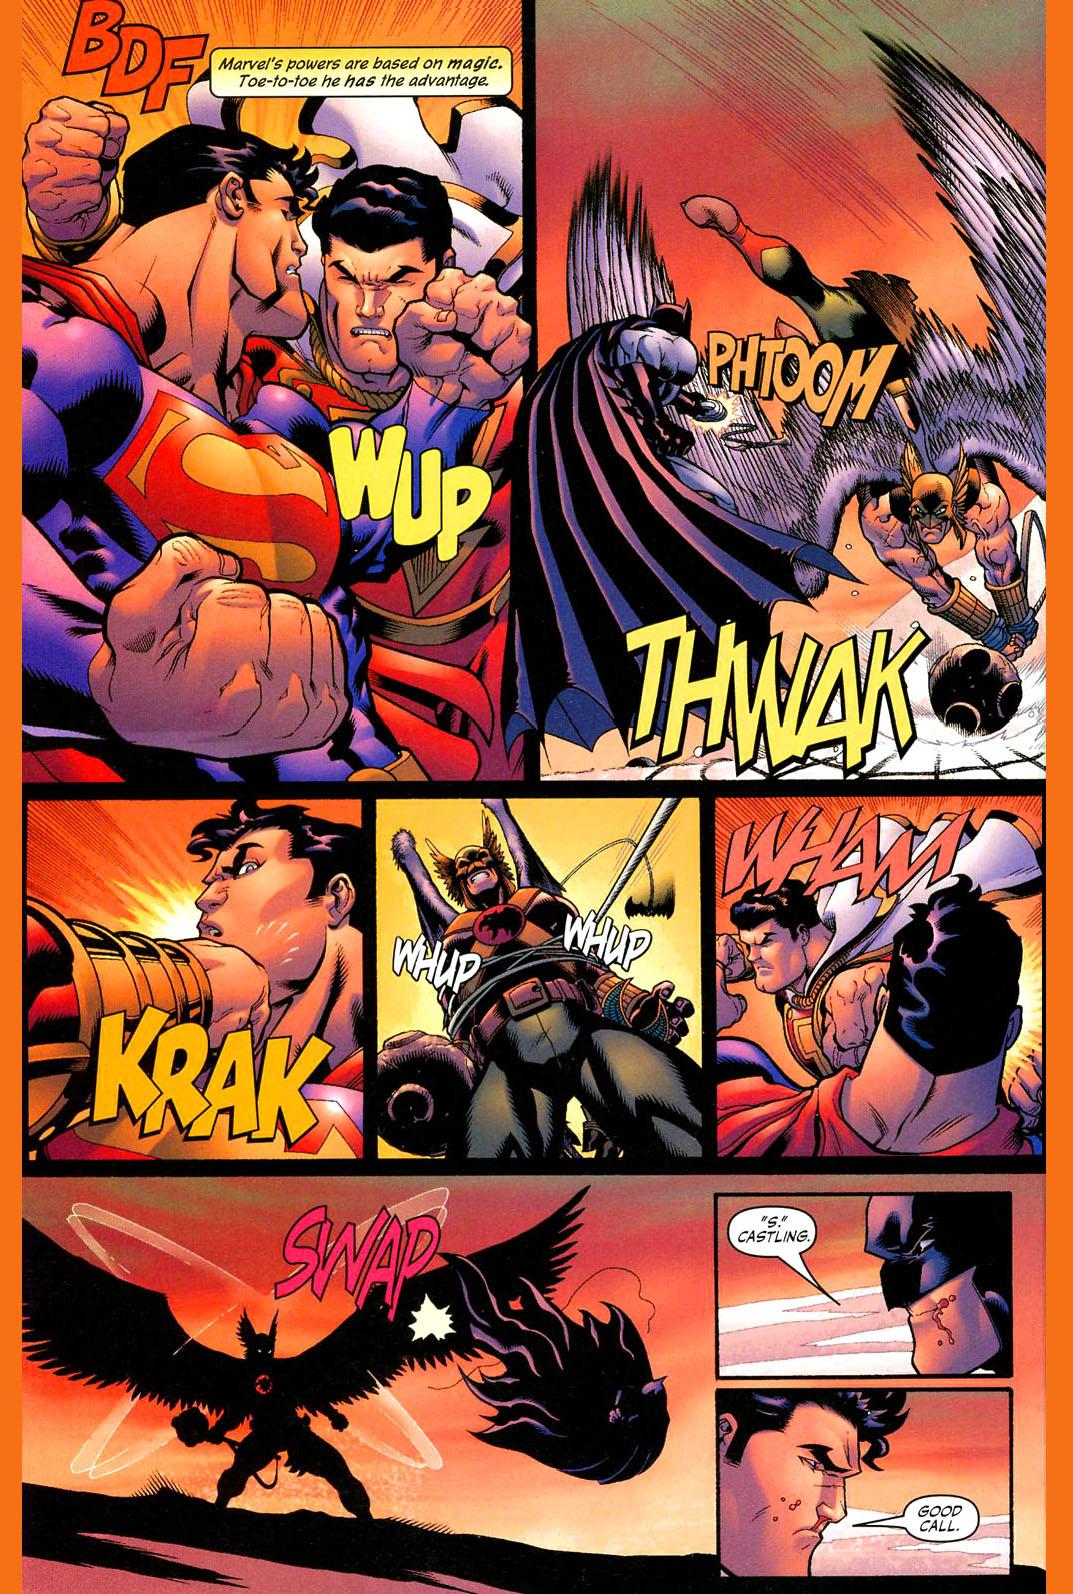 superman and batman vs hawkman and captain marvel